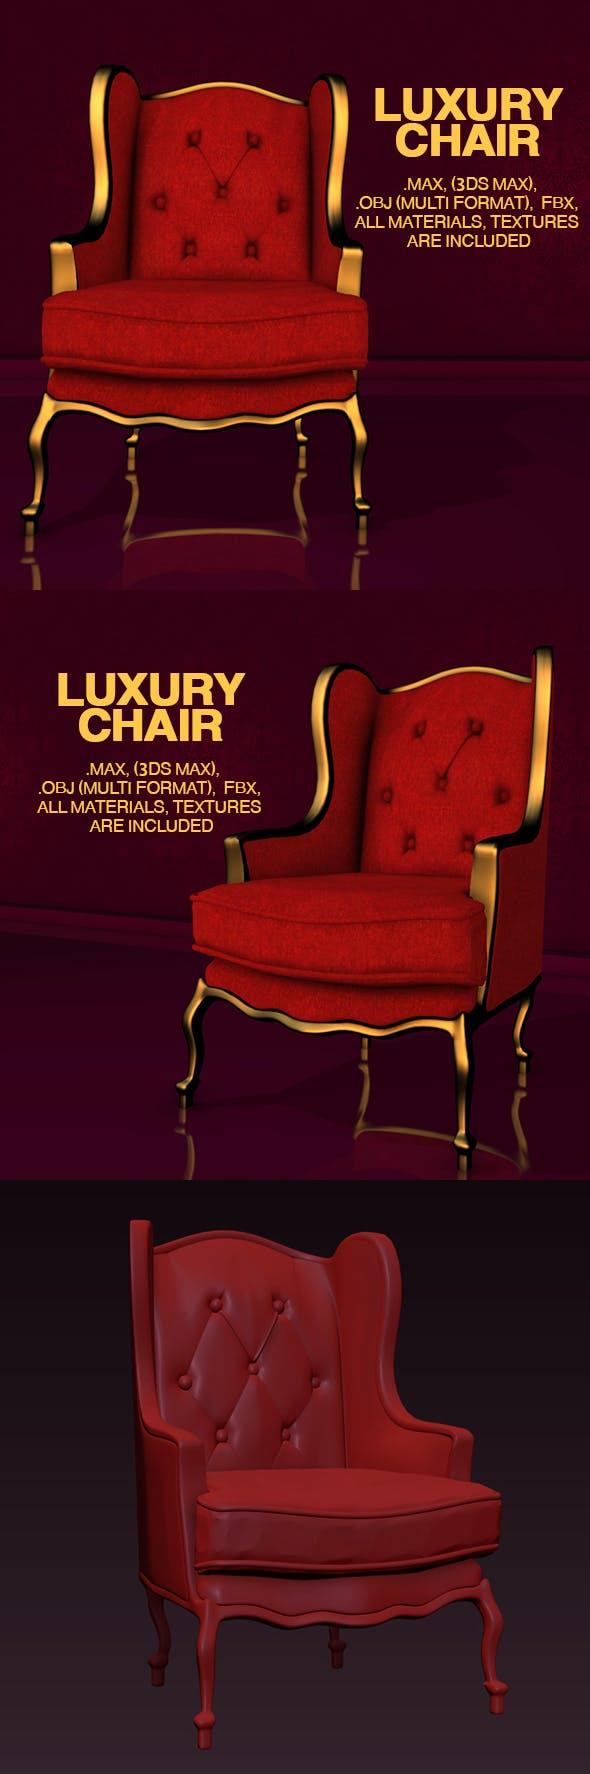 Luxury Chair - 3DOcean Item for Sale